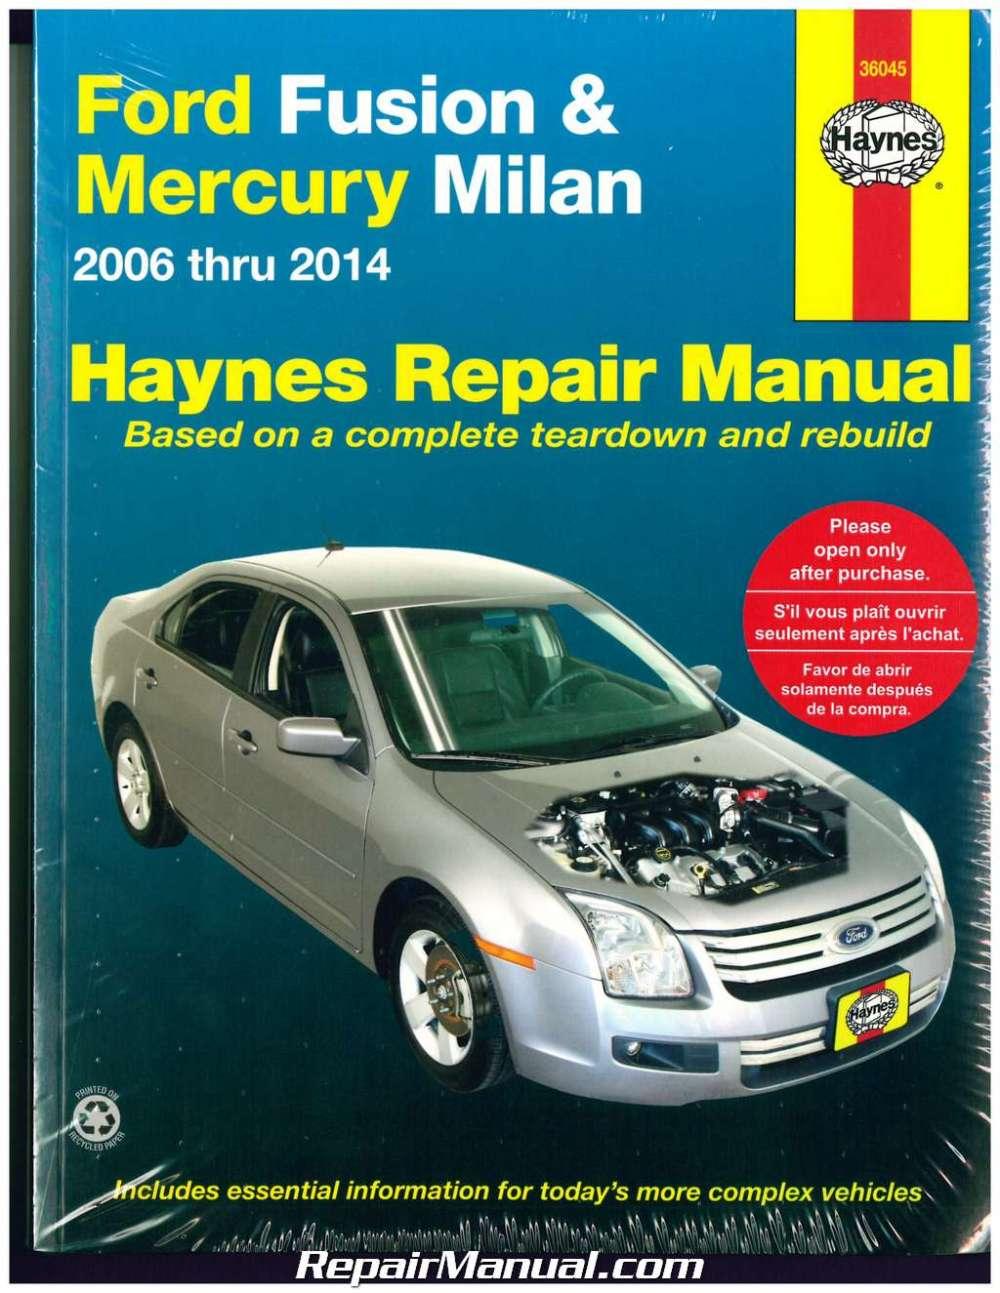 medium resolution of haynes ford fusion 2006 2014 mercury milan